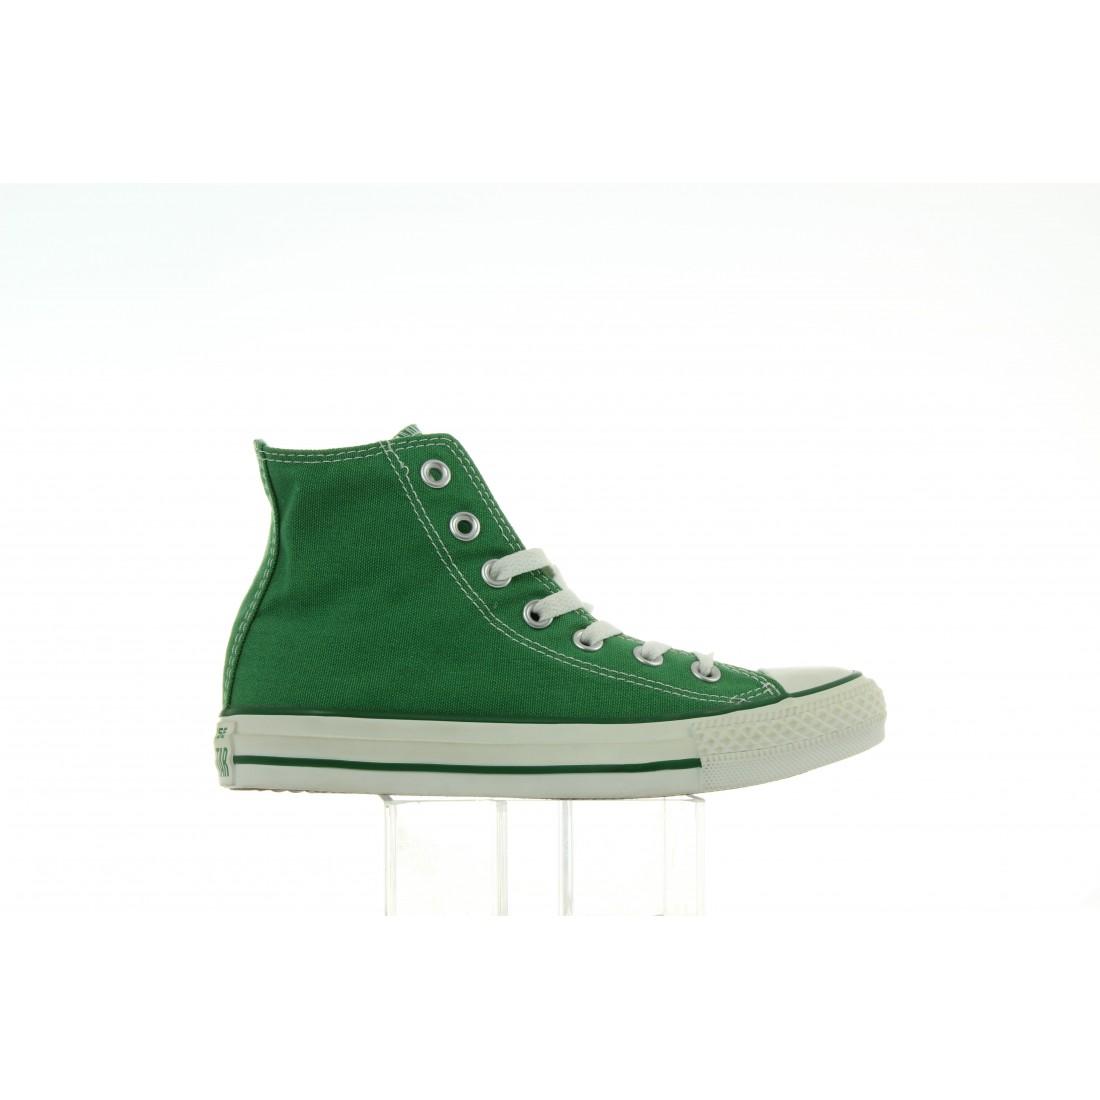 1J791 Zielony